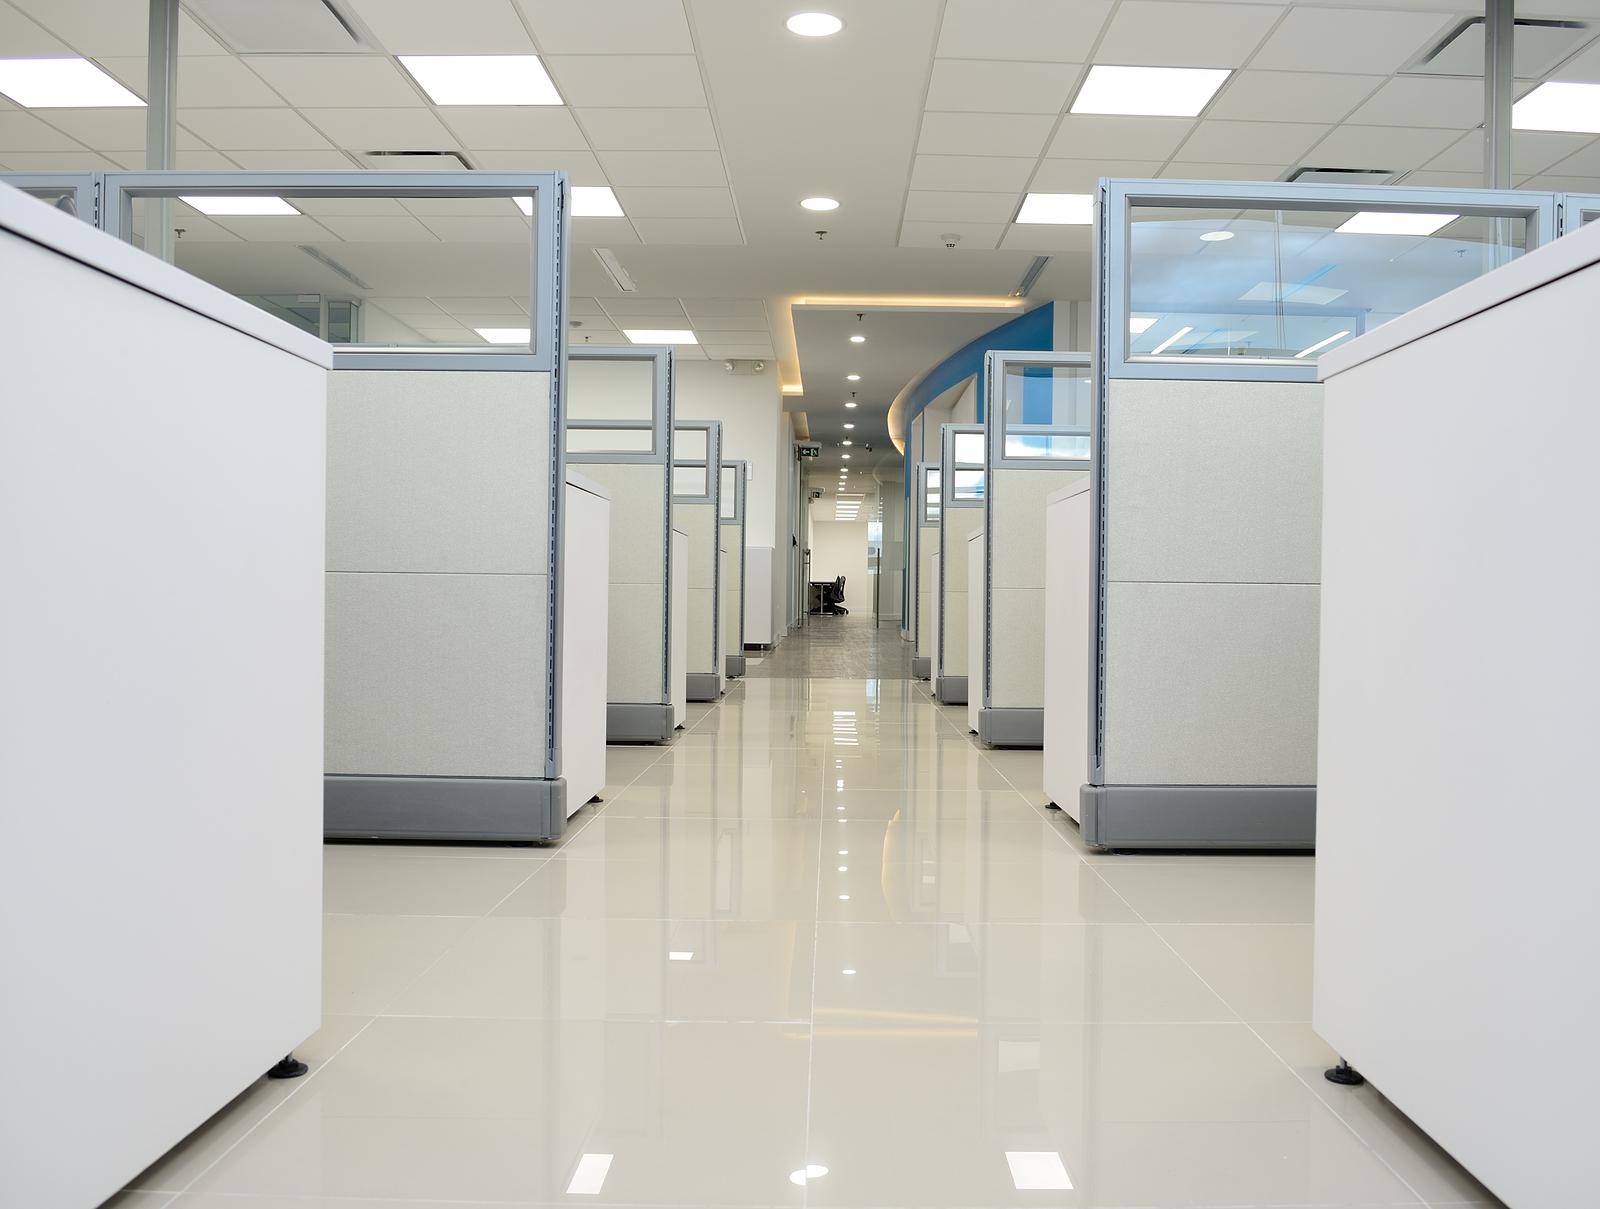 bigstock-Office-hallway--70181746.jpg